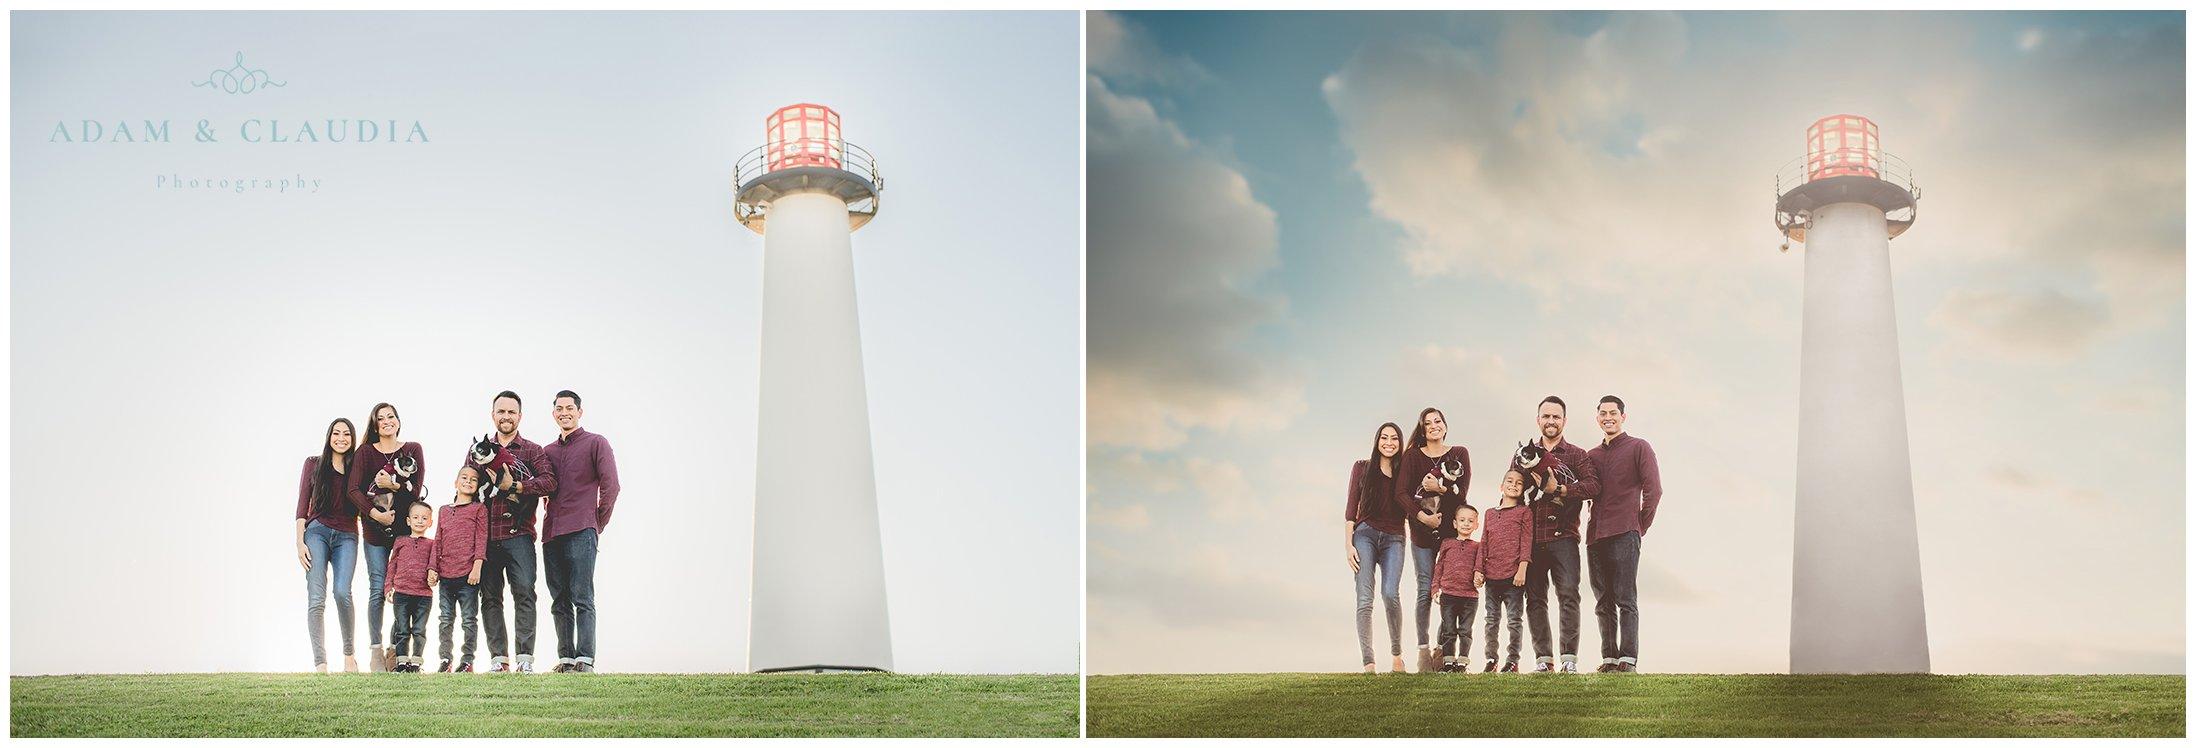 Family Portrait next to lighthouse